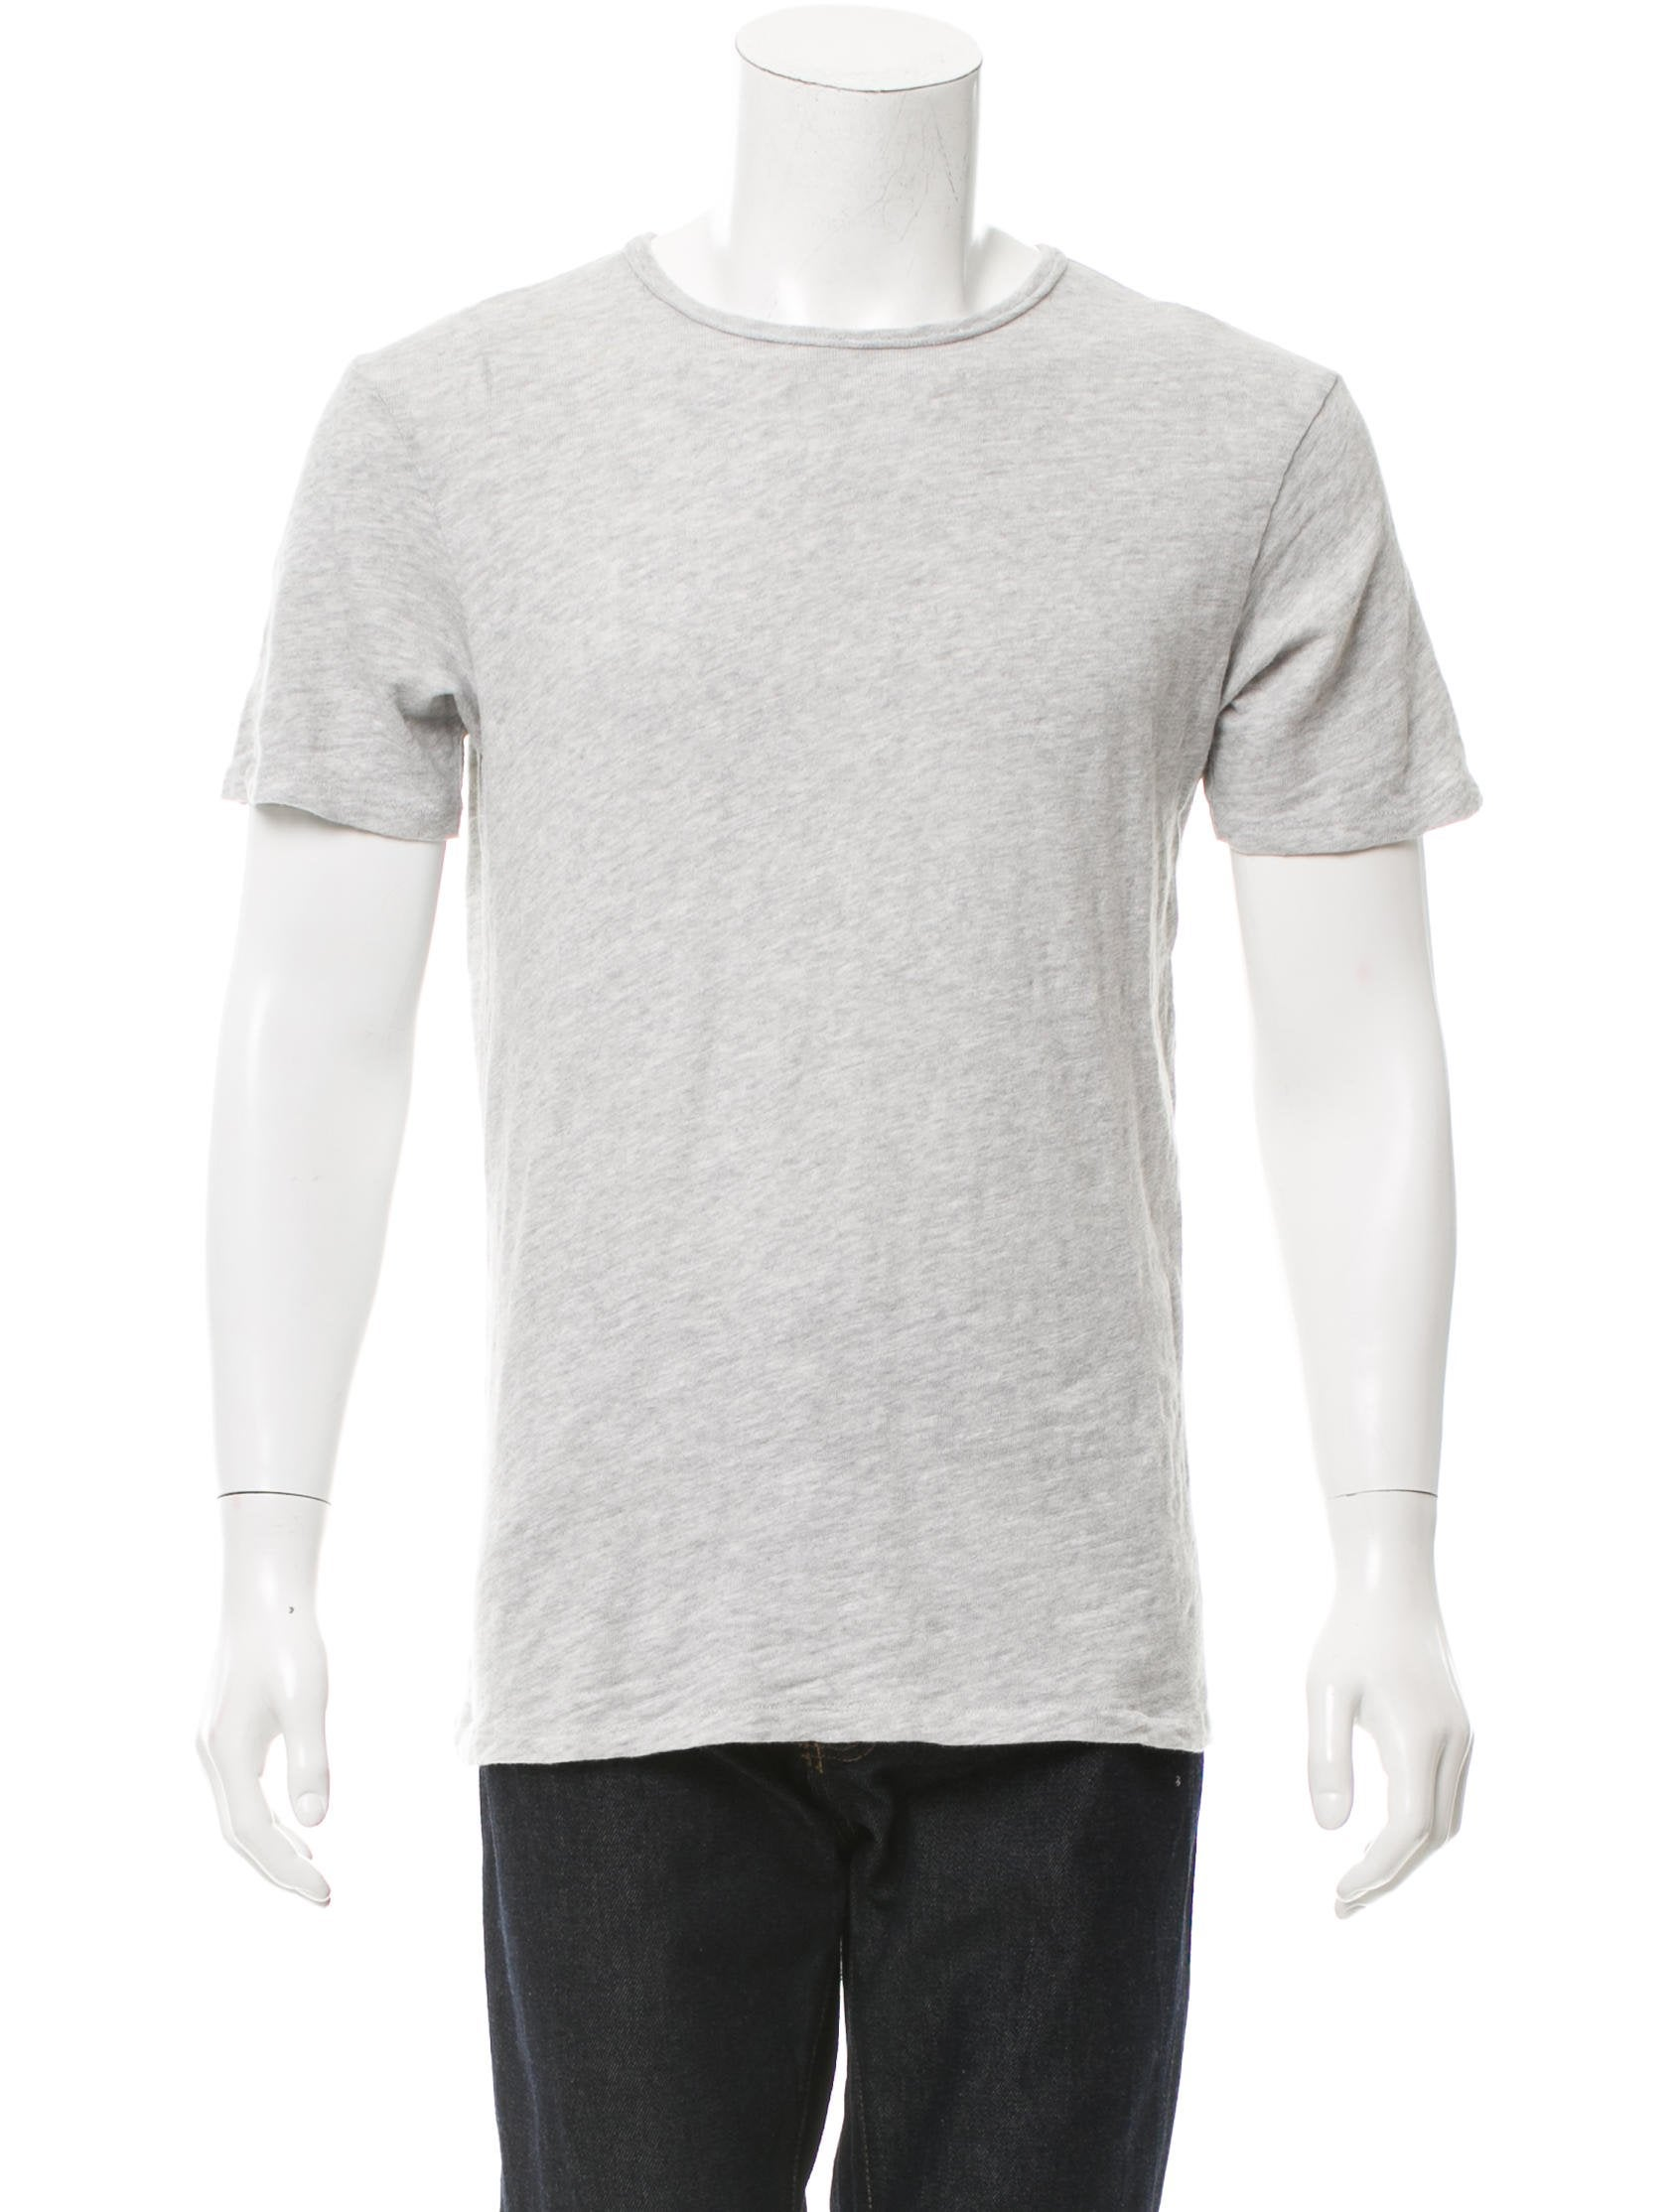 Rag Bone Short Sleeve Bateau Neck T Shirt Clothing